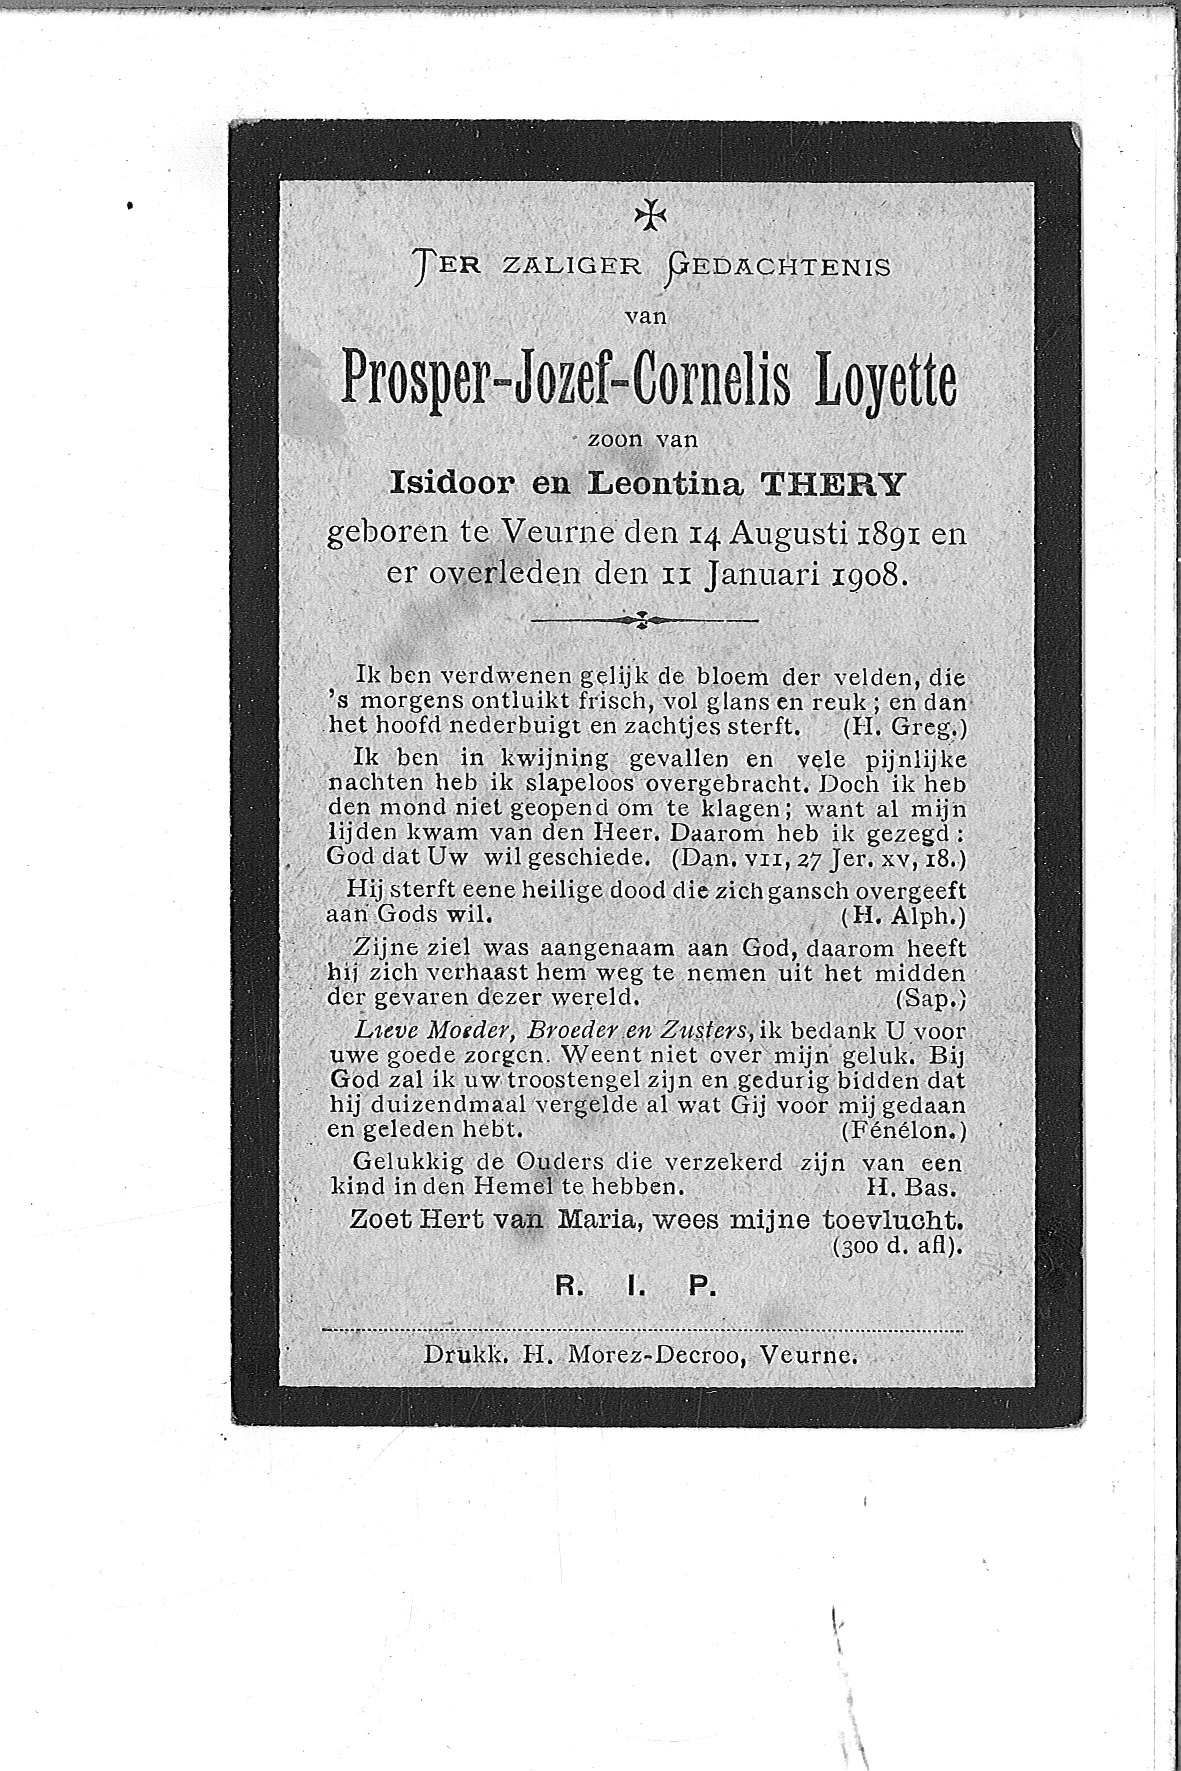 Prosper Jozef Cornelis(1908)20140506153427_00023.jpg